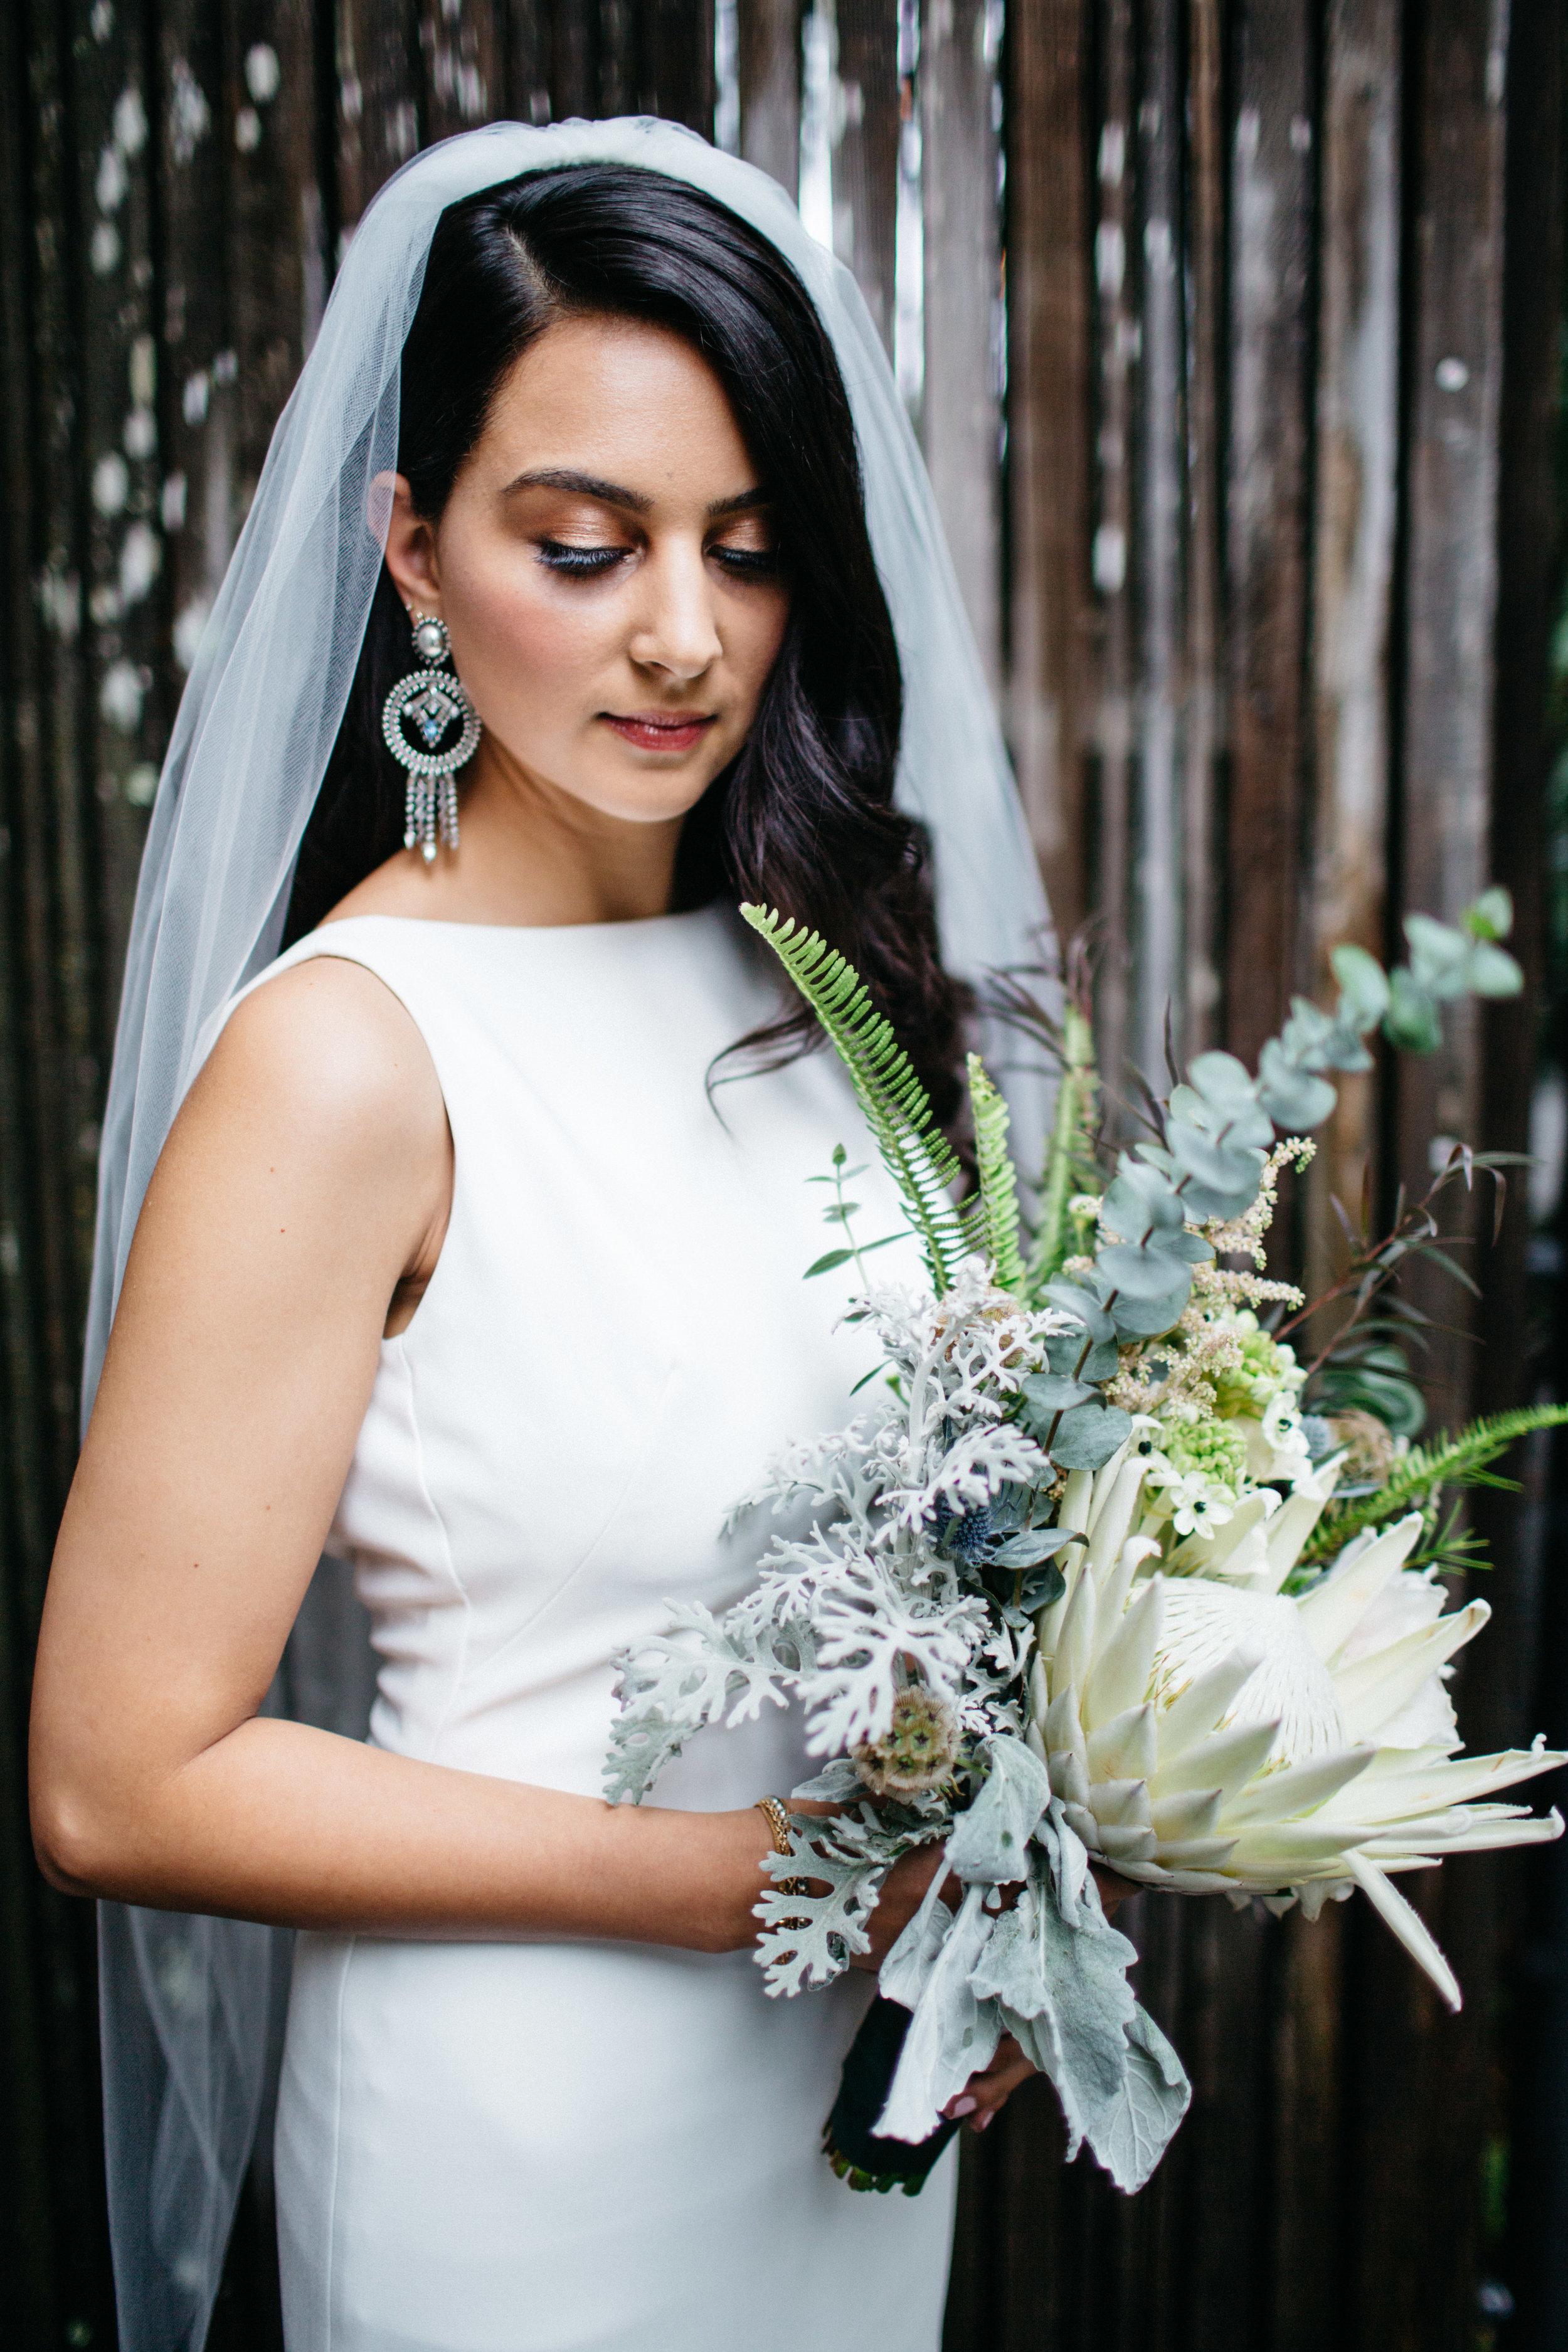 sweet_and_crafty_jocelyn_domingo_wedding_portfolio_022.jpg